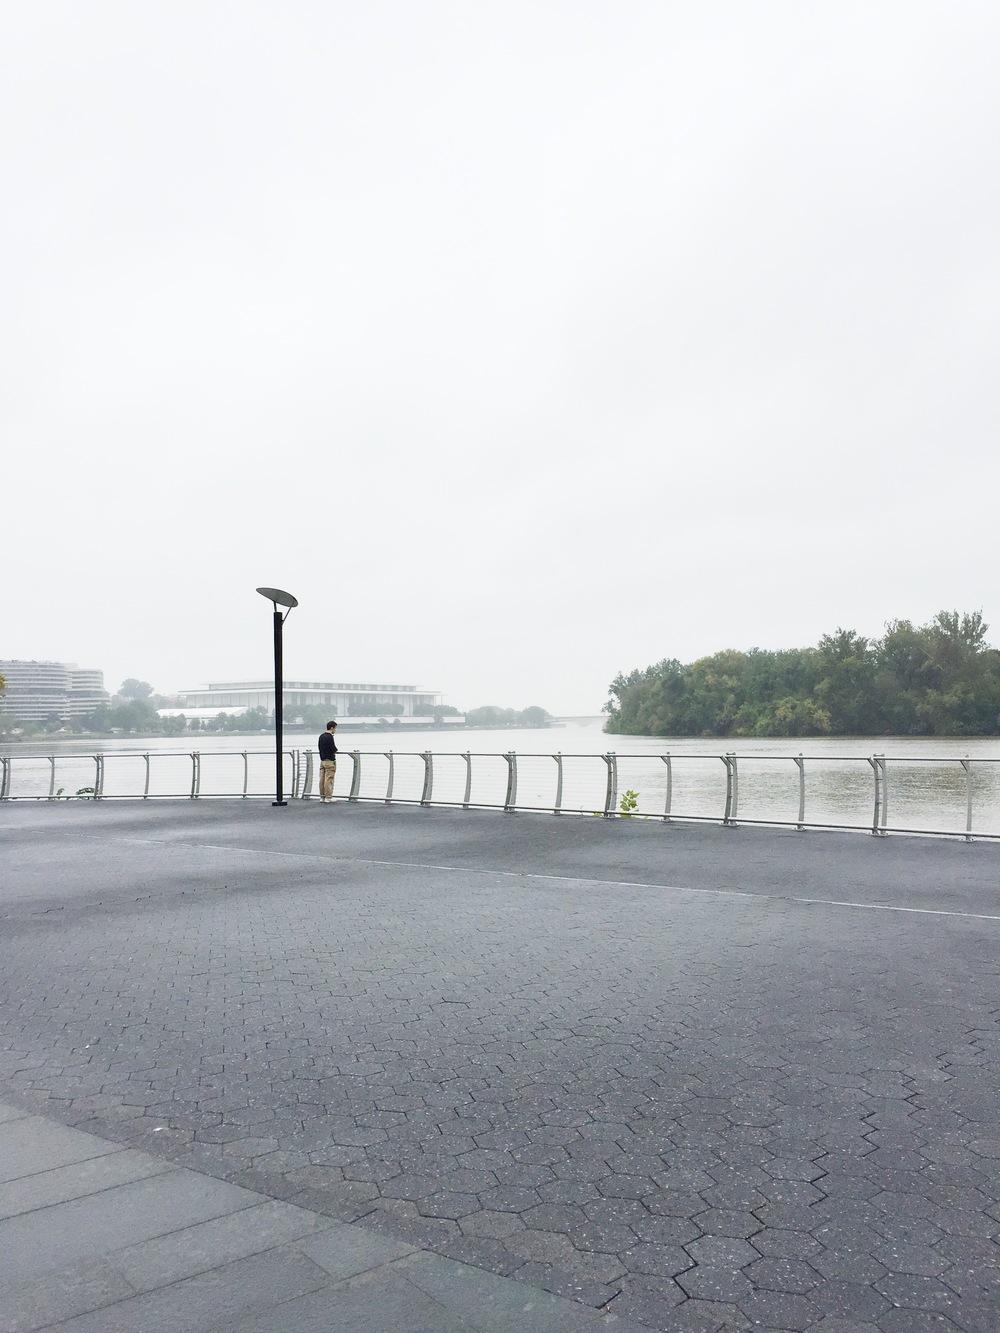 stranger at georgetown's waterfront